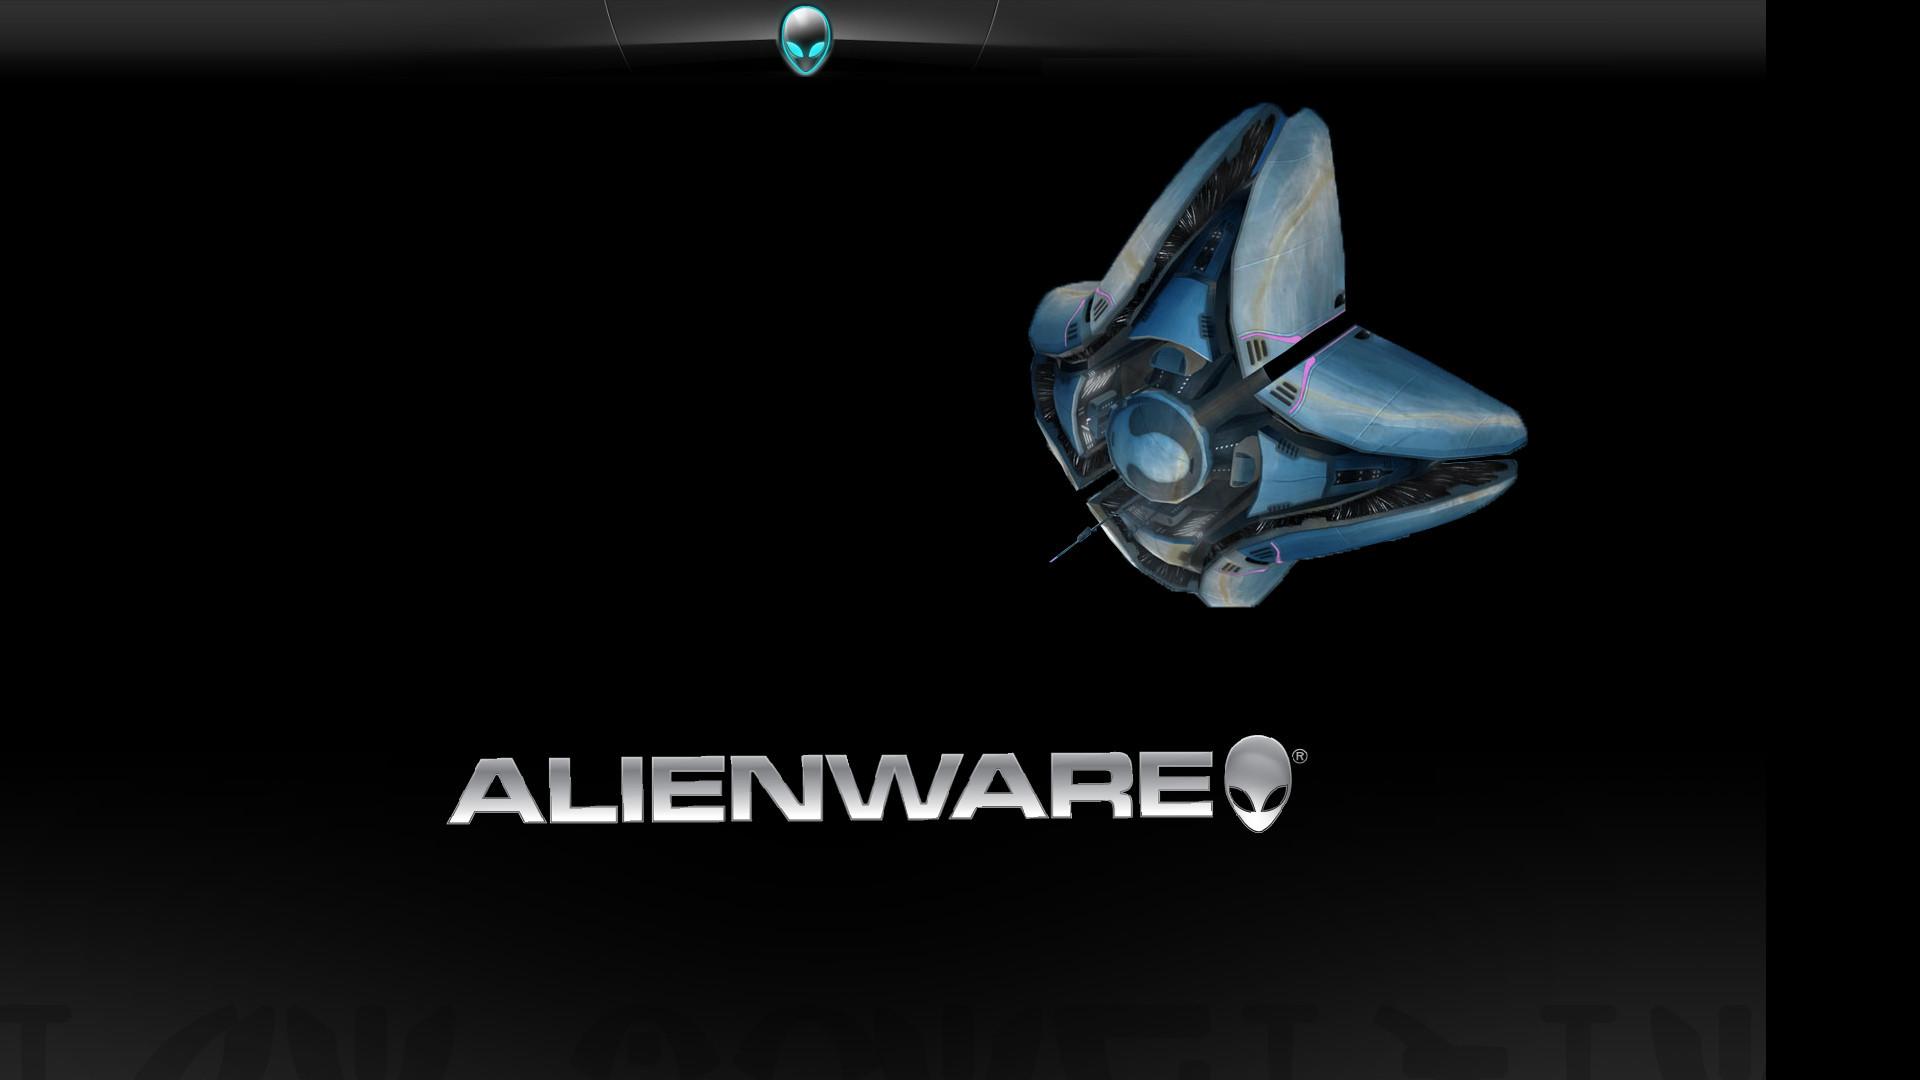 44 Alienware Wallpaper 1920×1080, HD Quality Alienware .